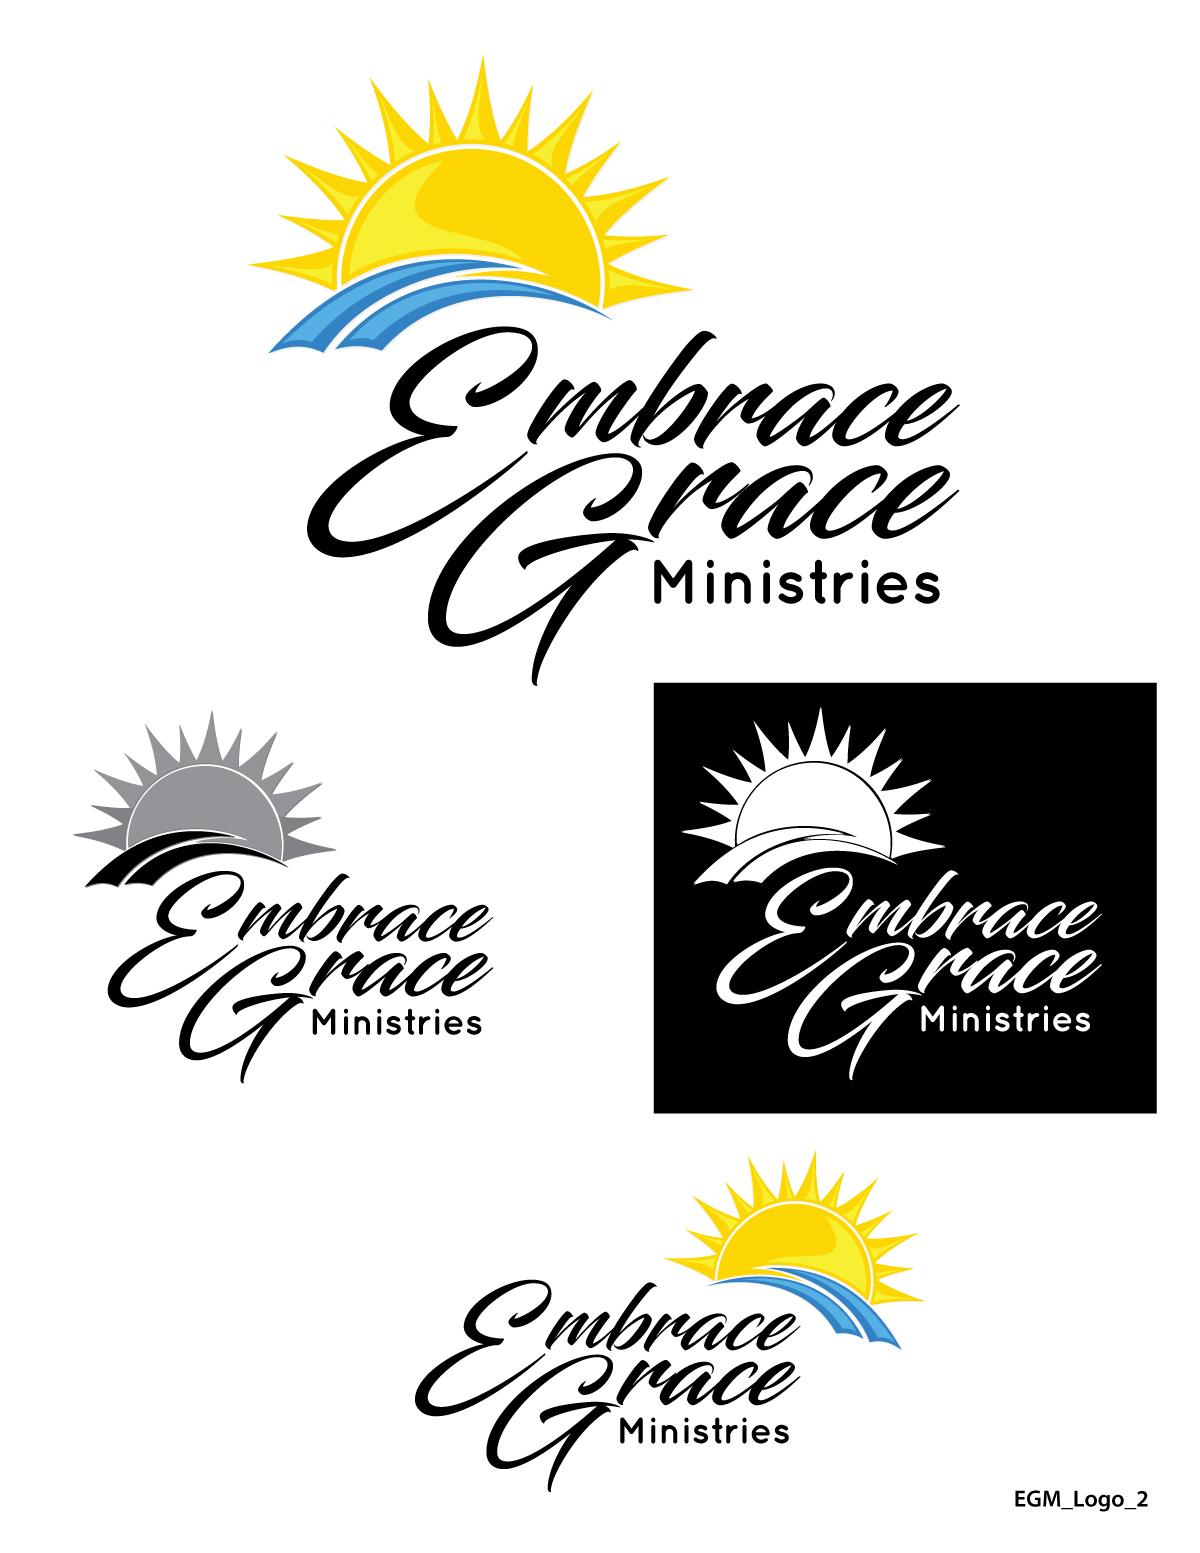 EGM_Logo_2.jpg